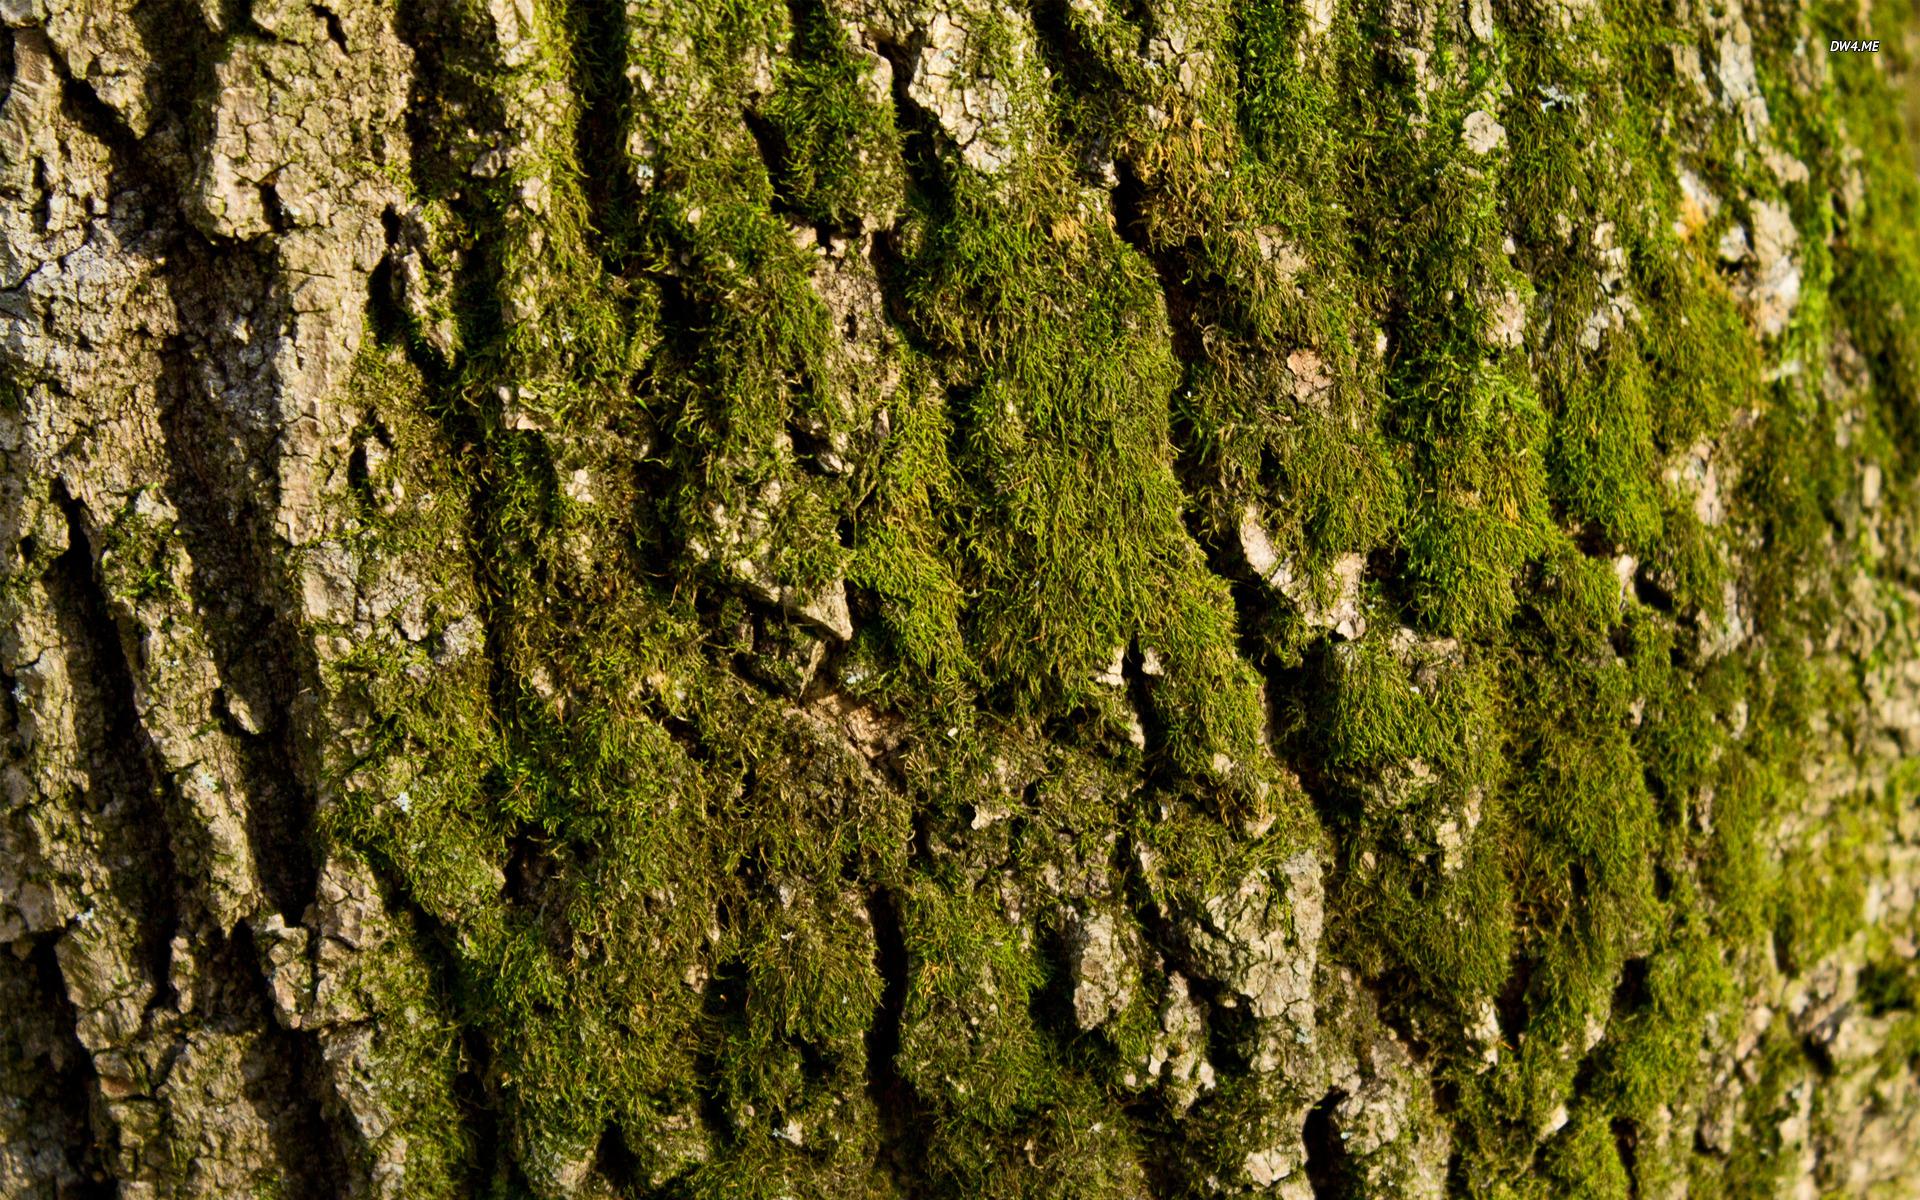 Mossy tree bark wallpaper   Nature wallpapers   958 1920x1200